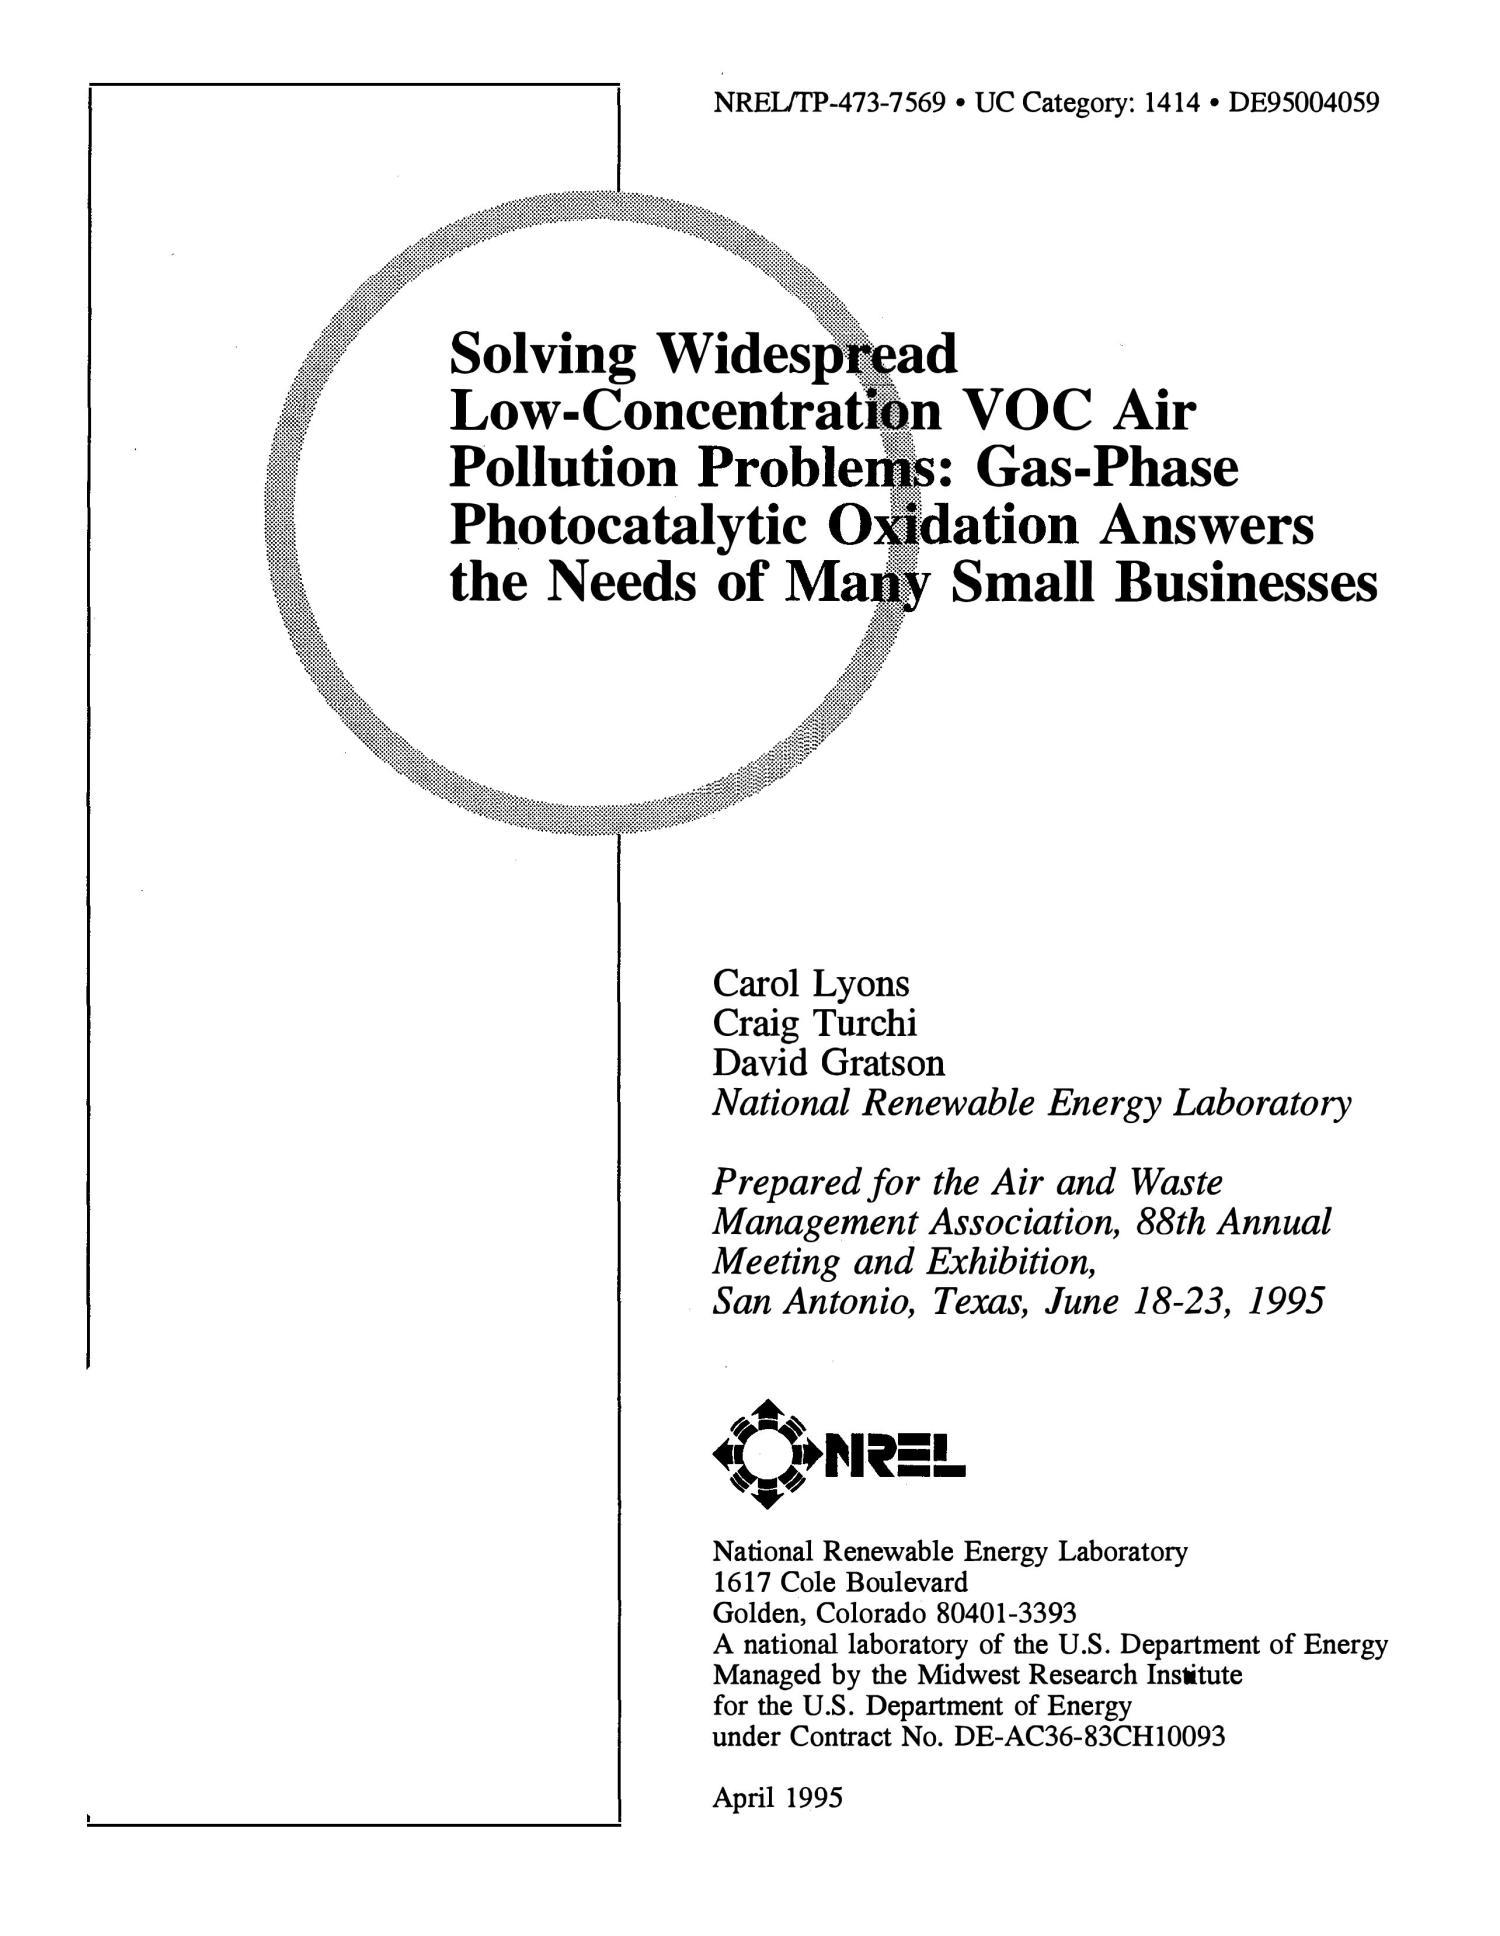 Solving widespread low-concentration VOC air pollution